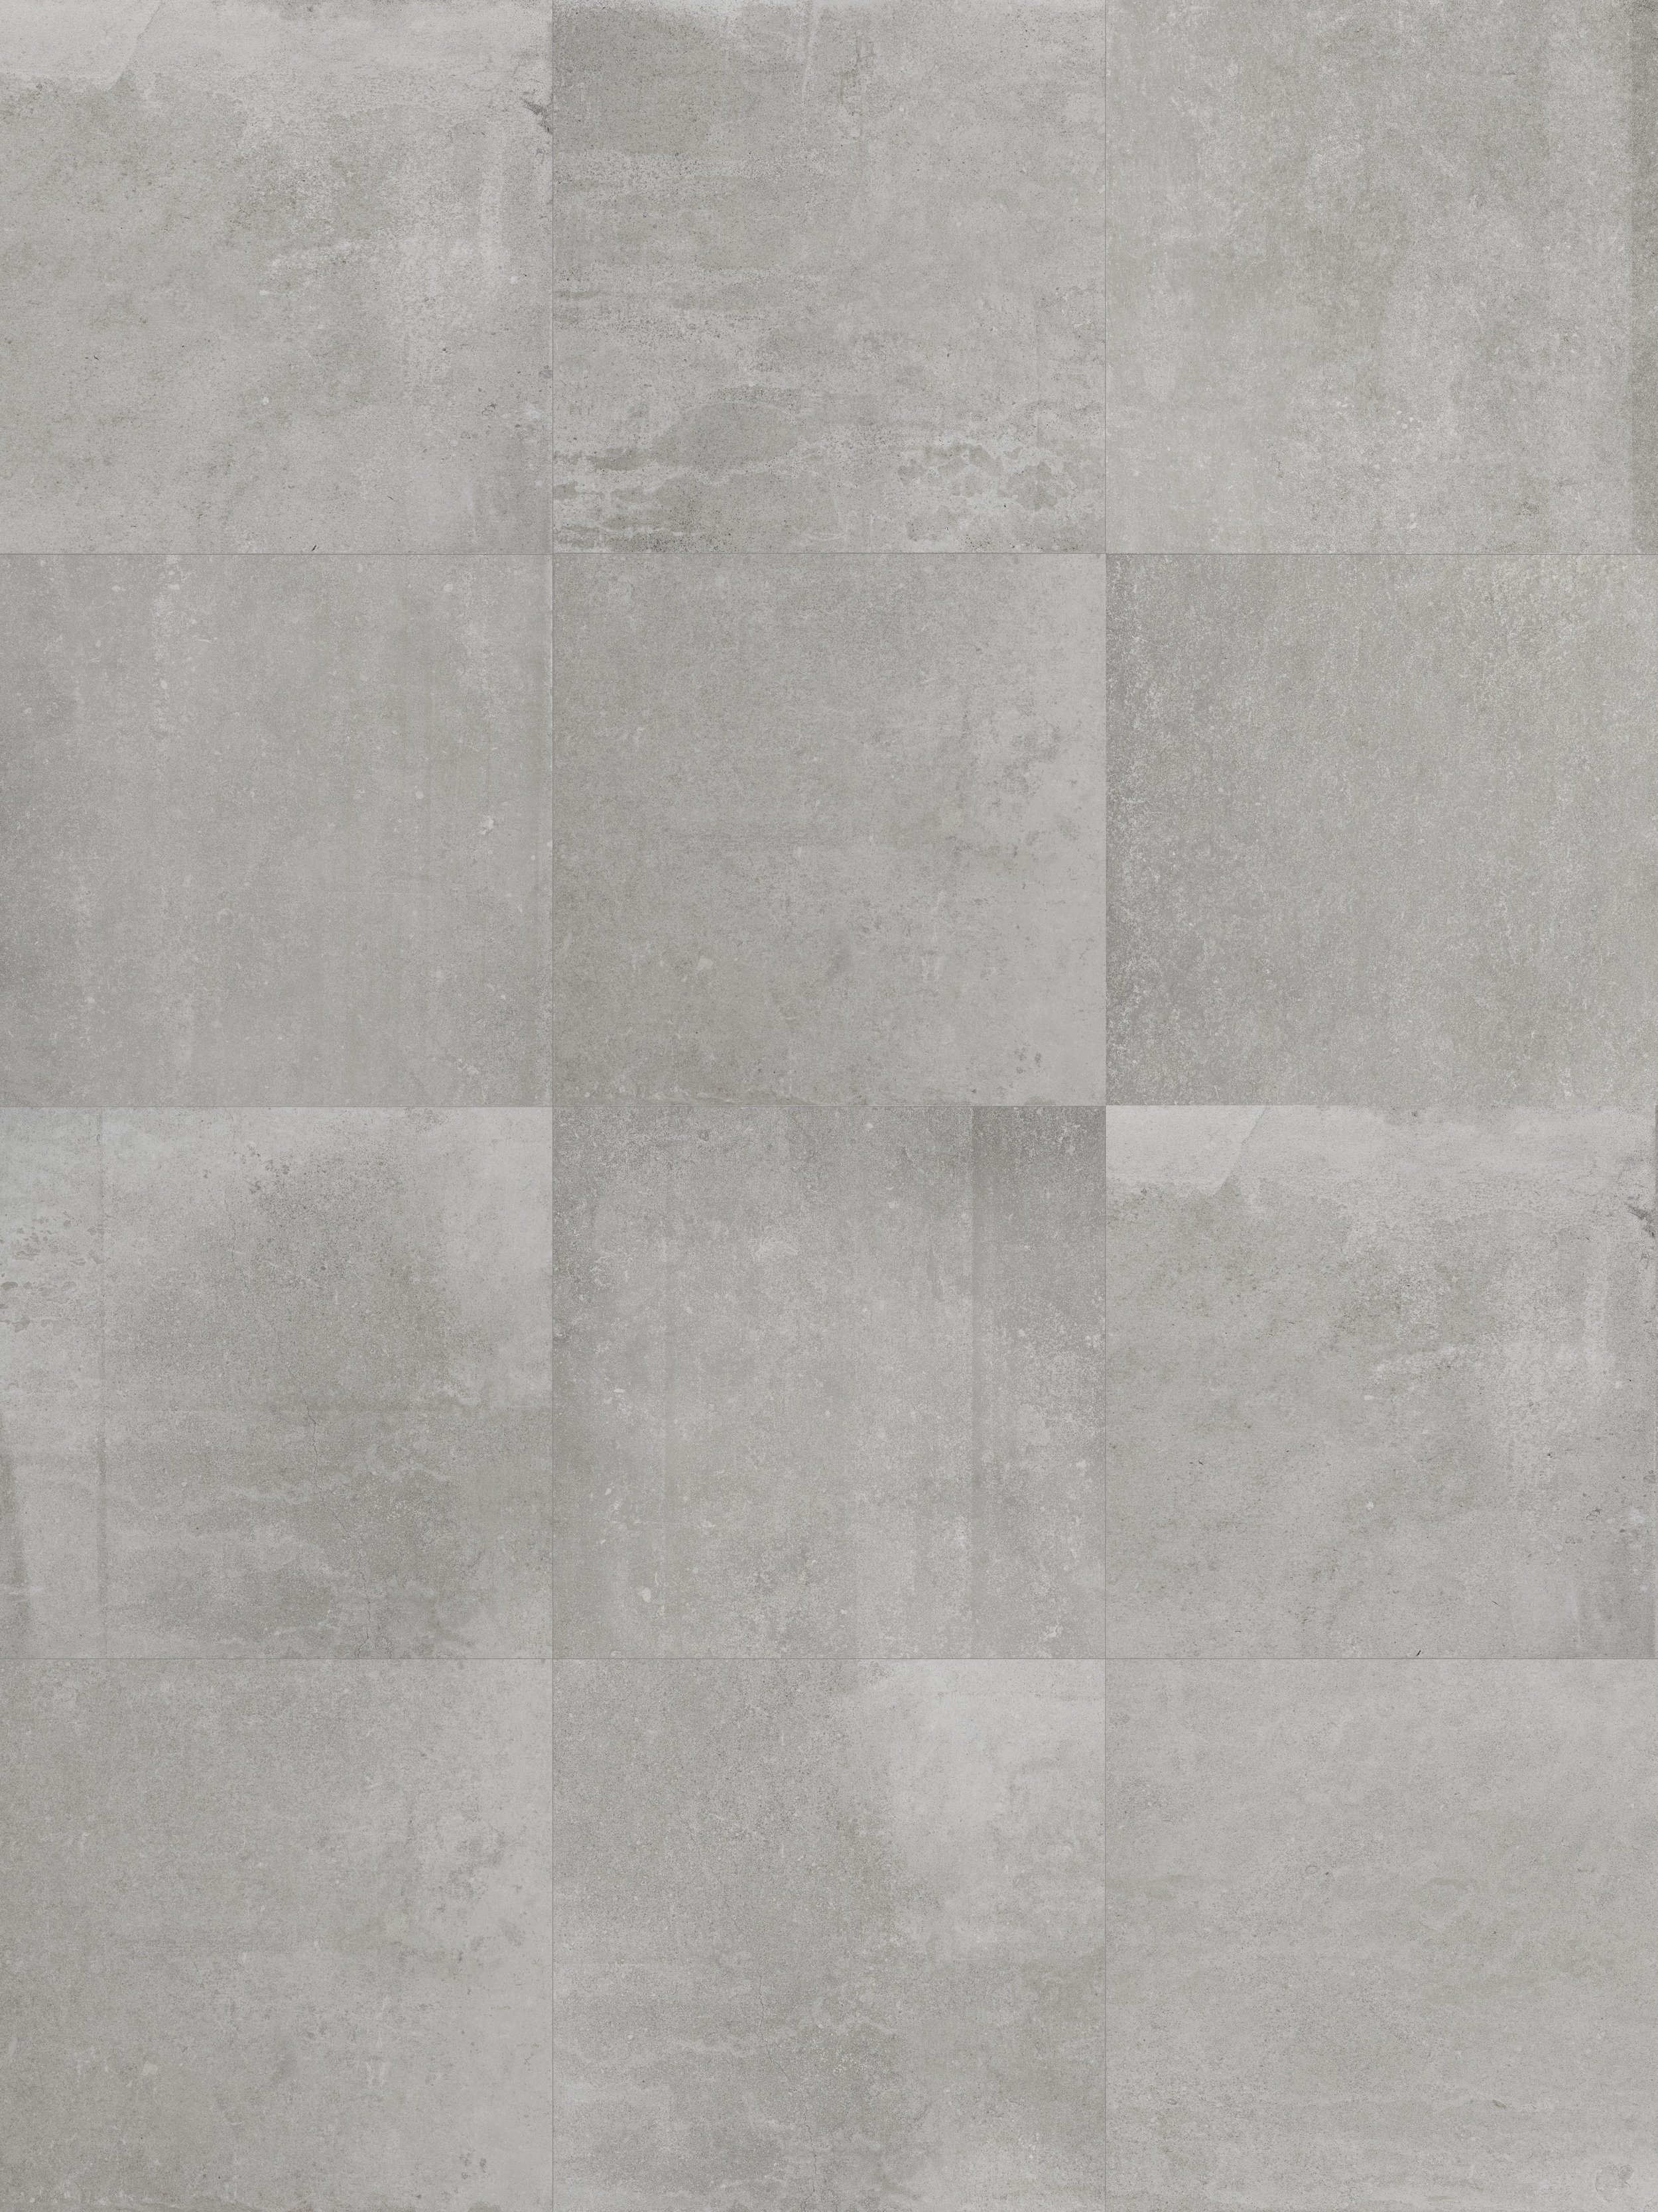 Stonedesign_Ash 60x60 matt.jpg